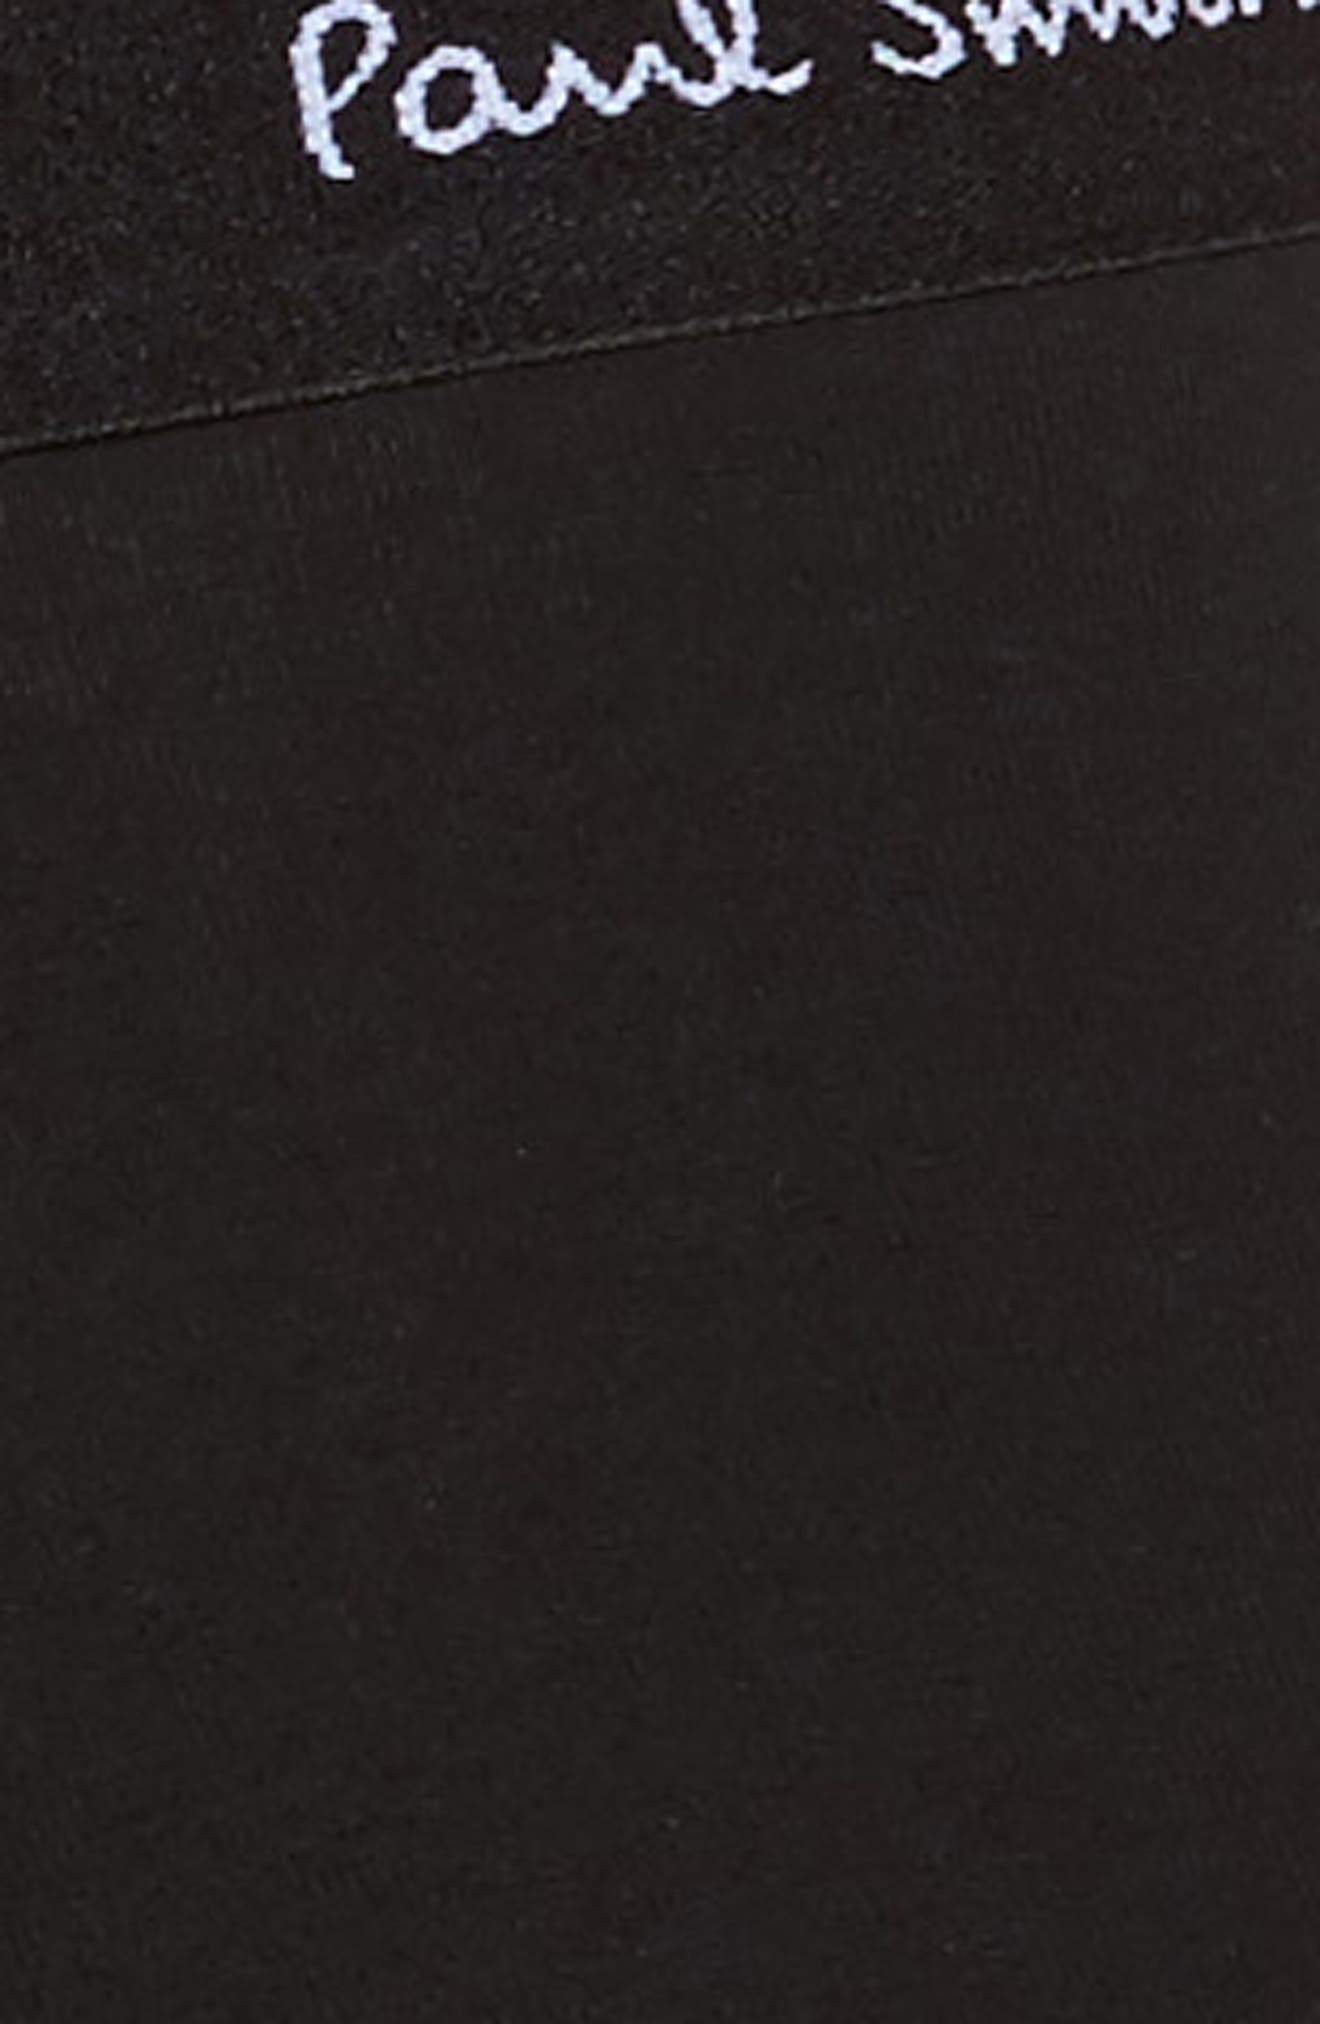 3-Pack Square Cut Trunks,                             Alternate thumbnail 9, color,